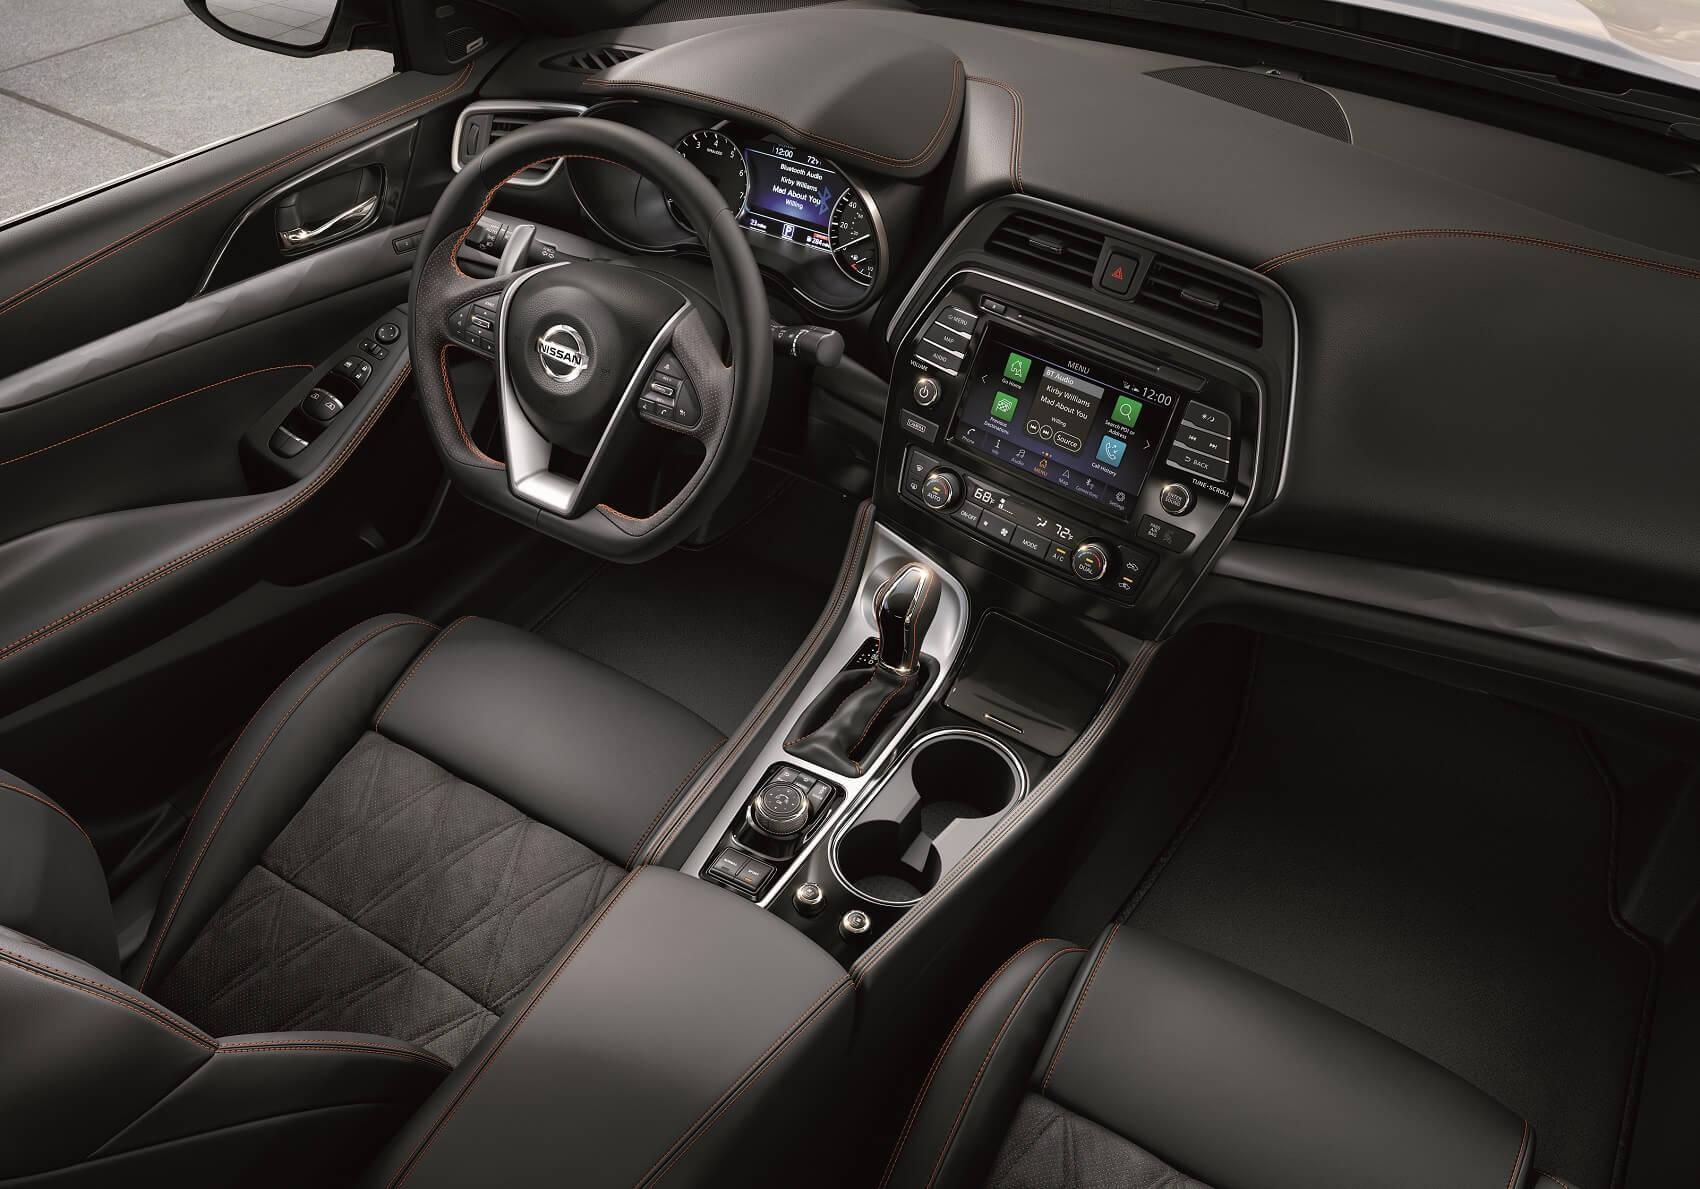 Nissan Maxima Interior Space